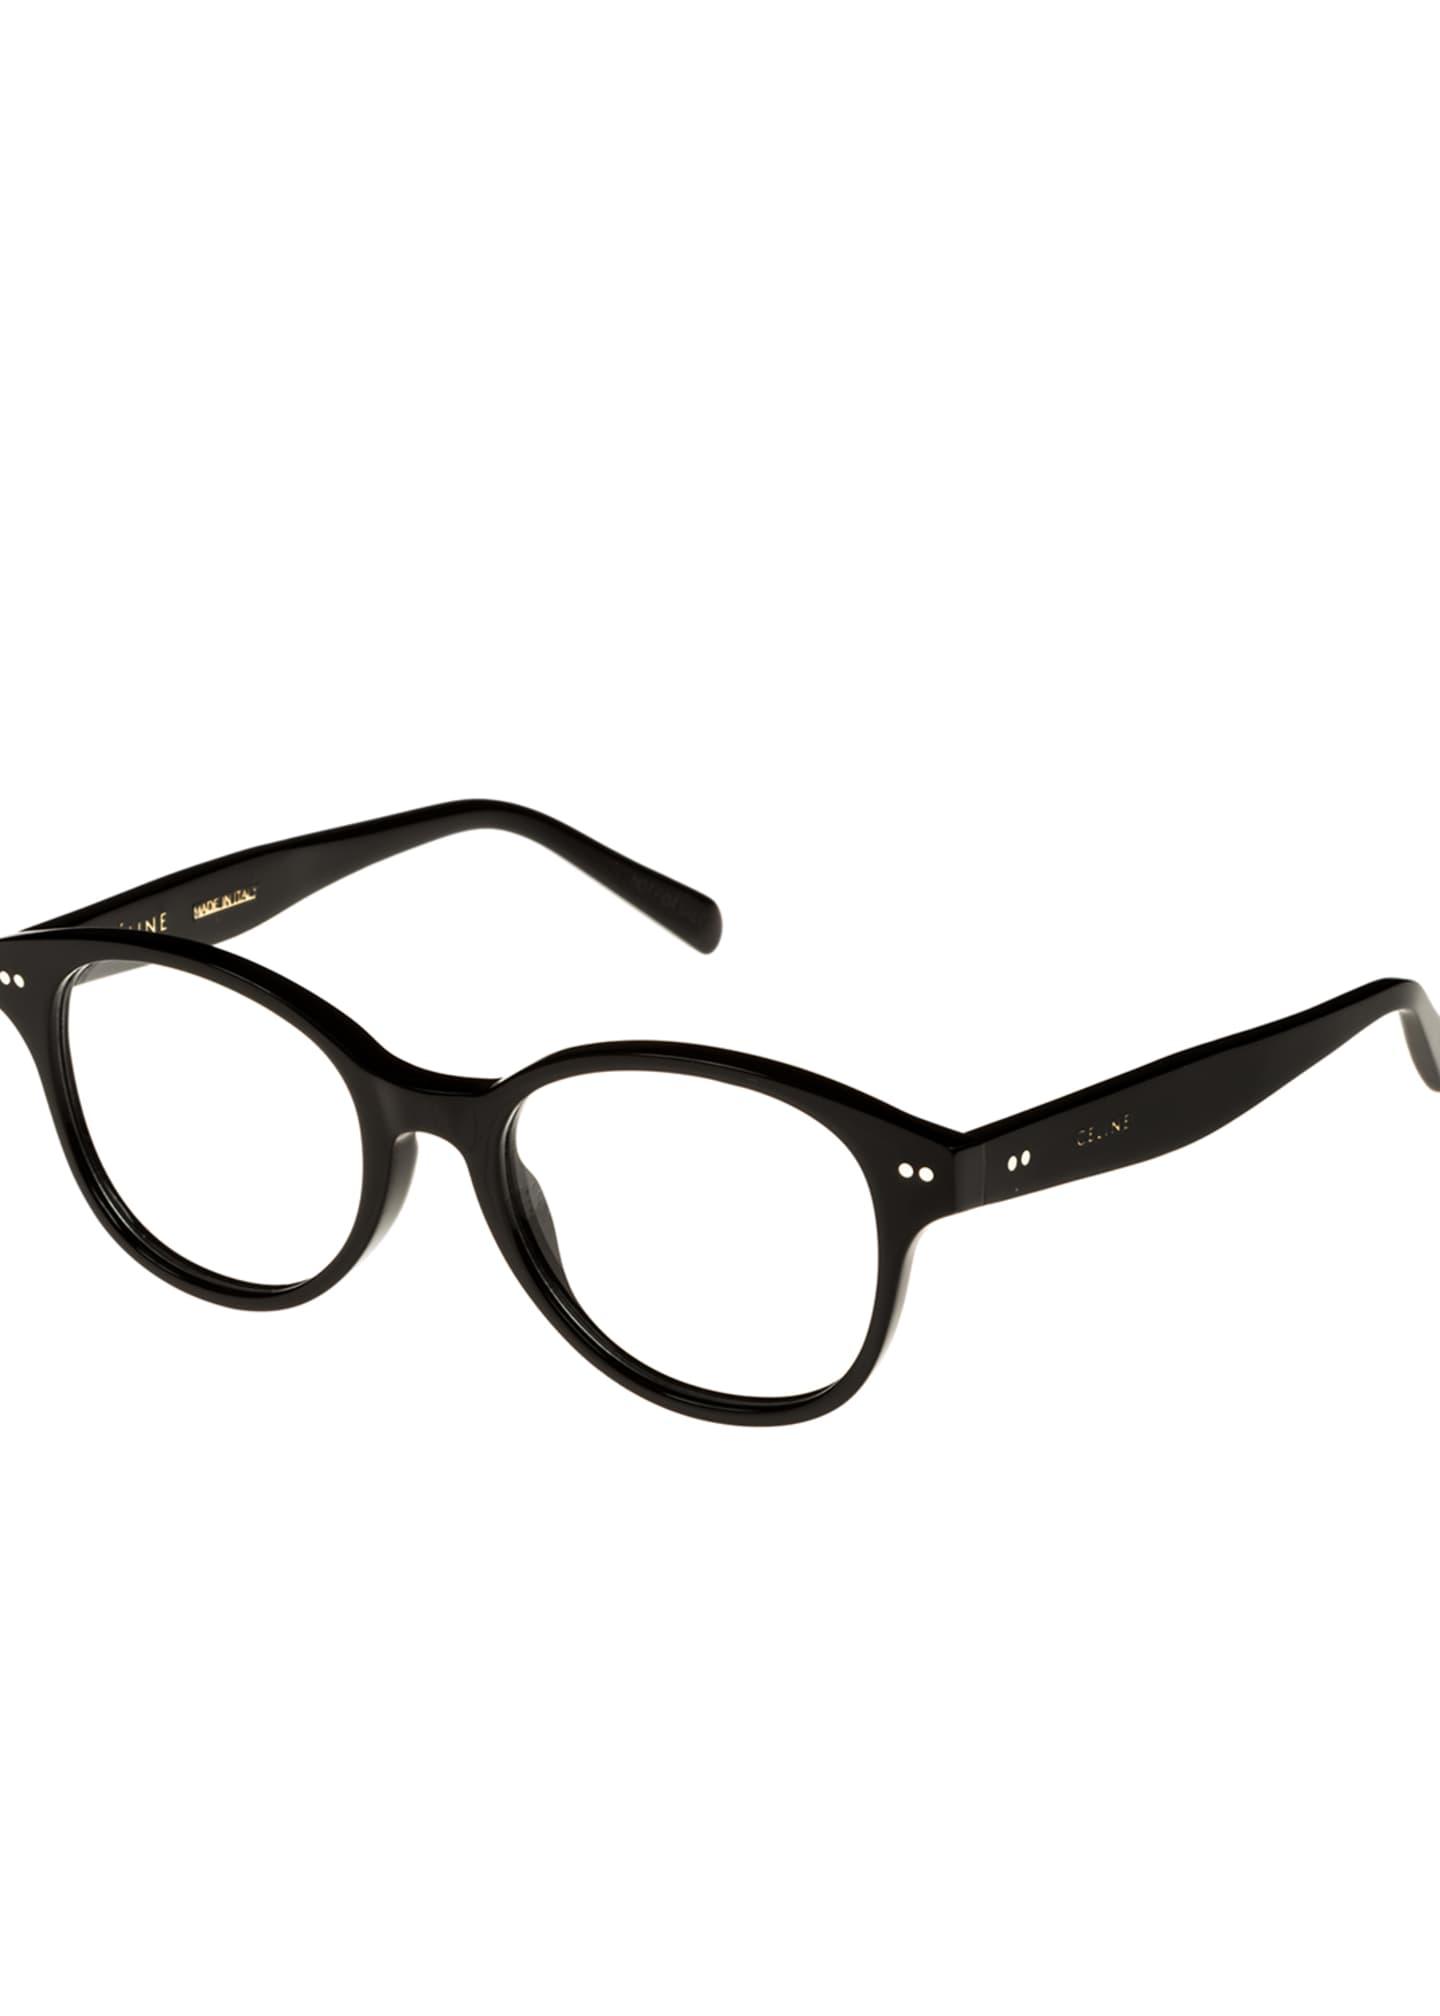 Celine Round Acetate Optical Frames, Black